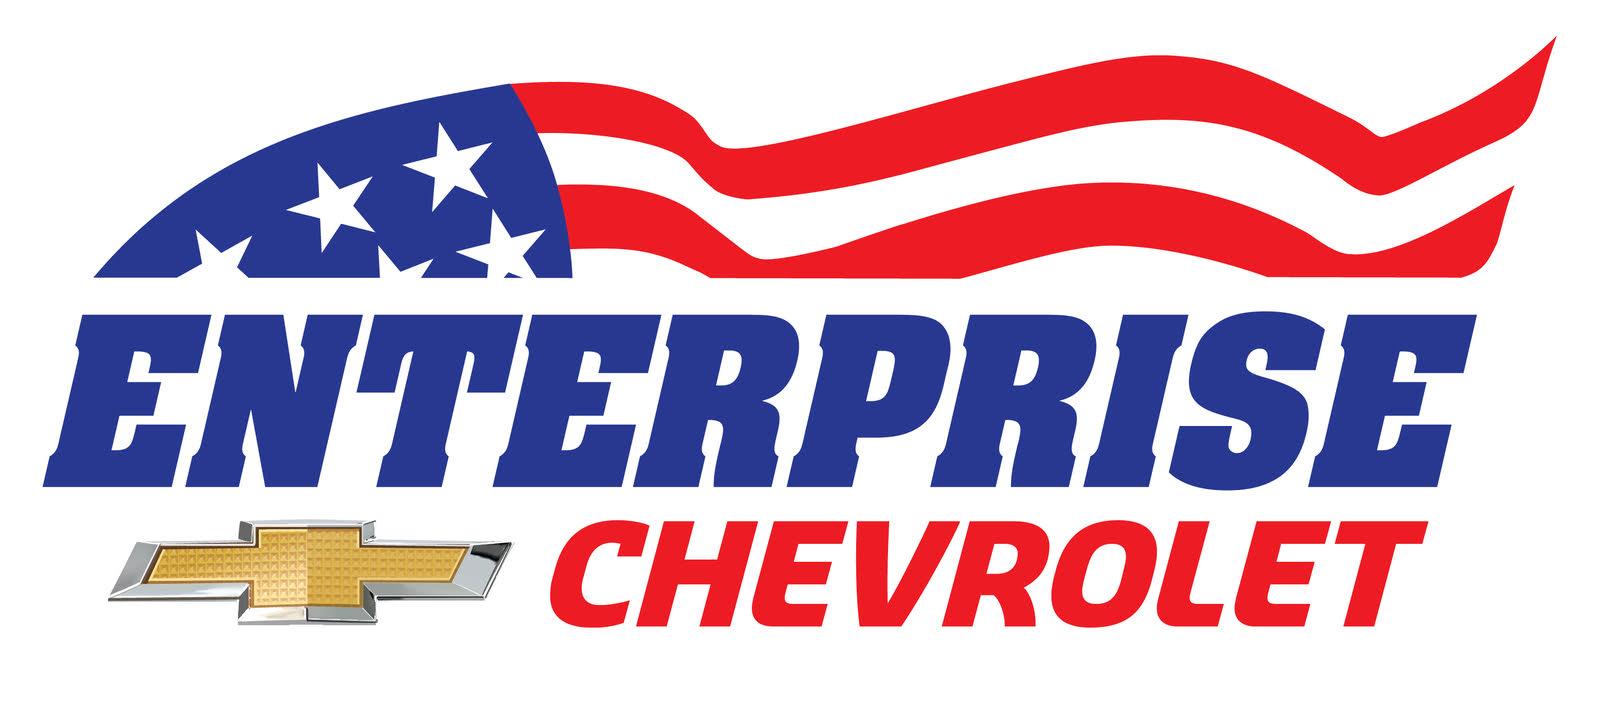 Enterprise Chevrolet